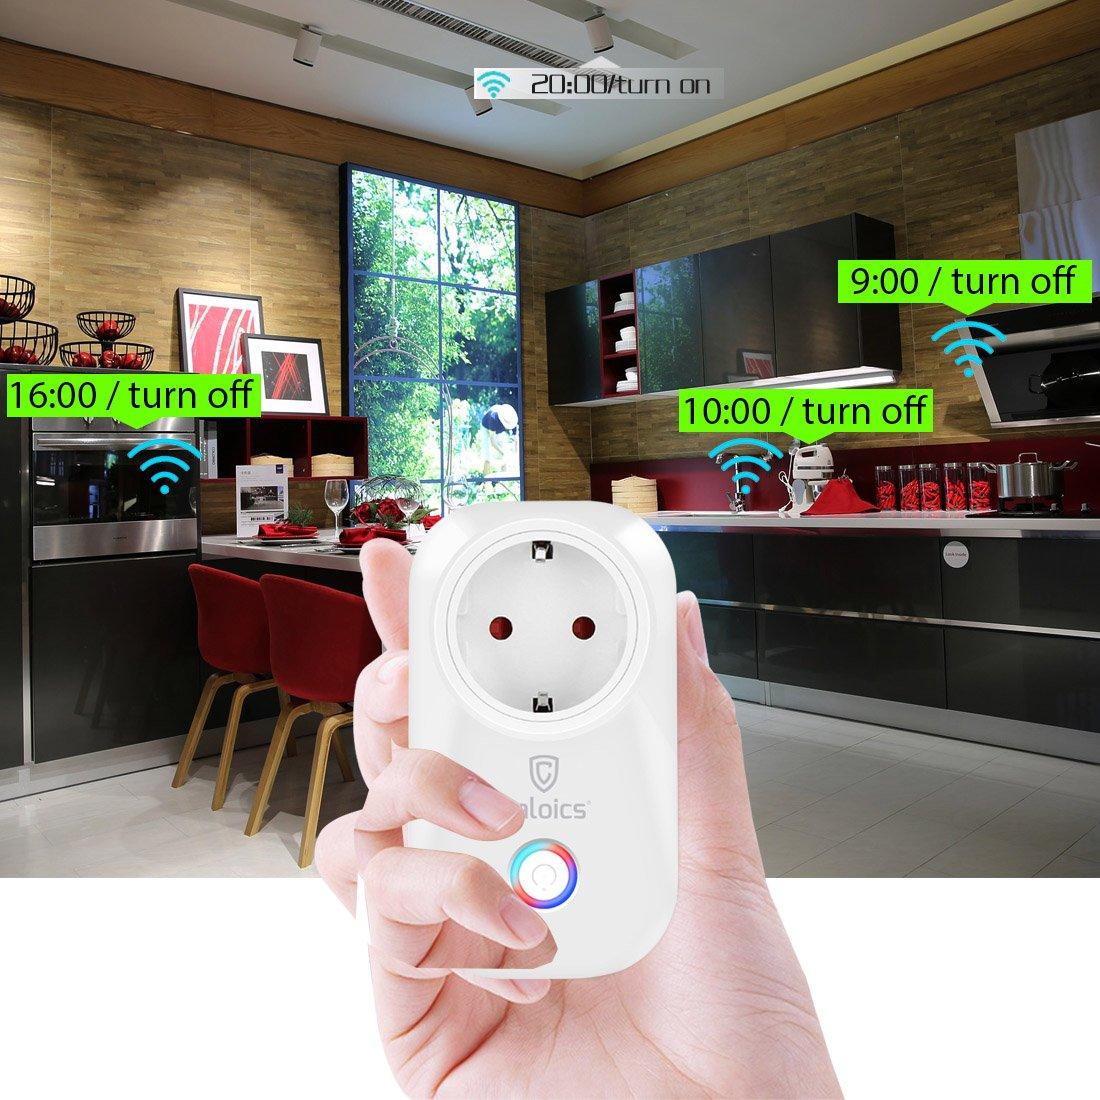 Smart WiFi Plug, Caloics intelligente WLAN Steckdose, schaltbare ...